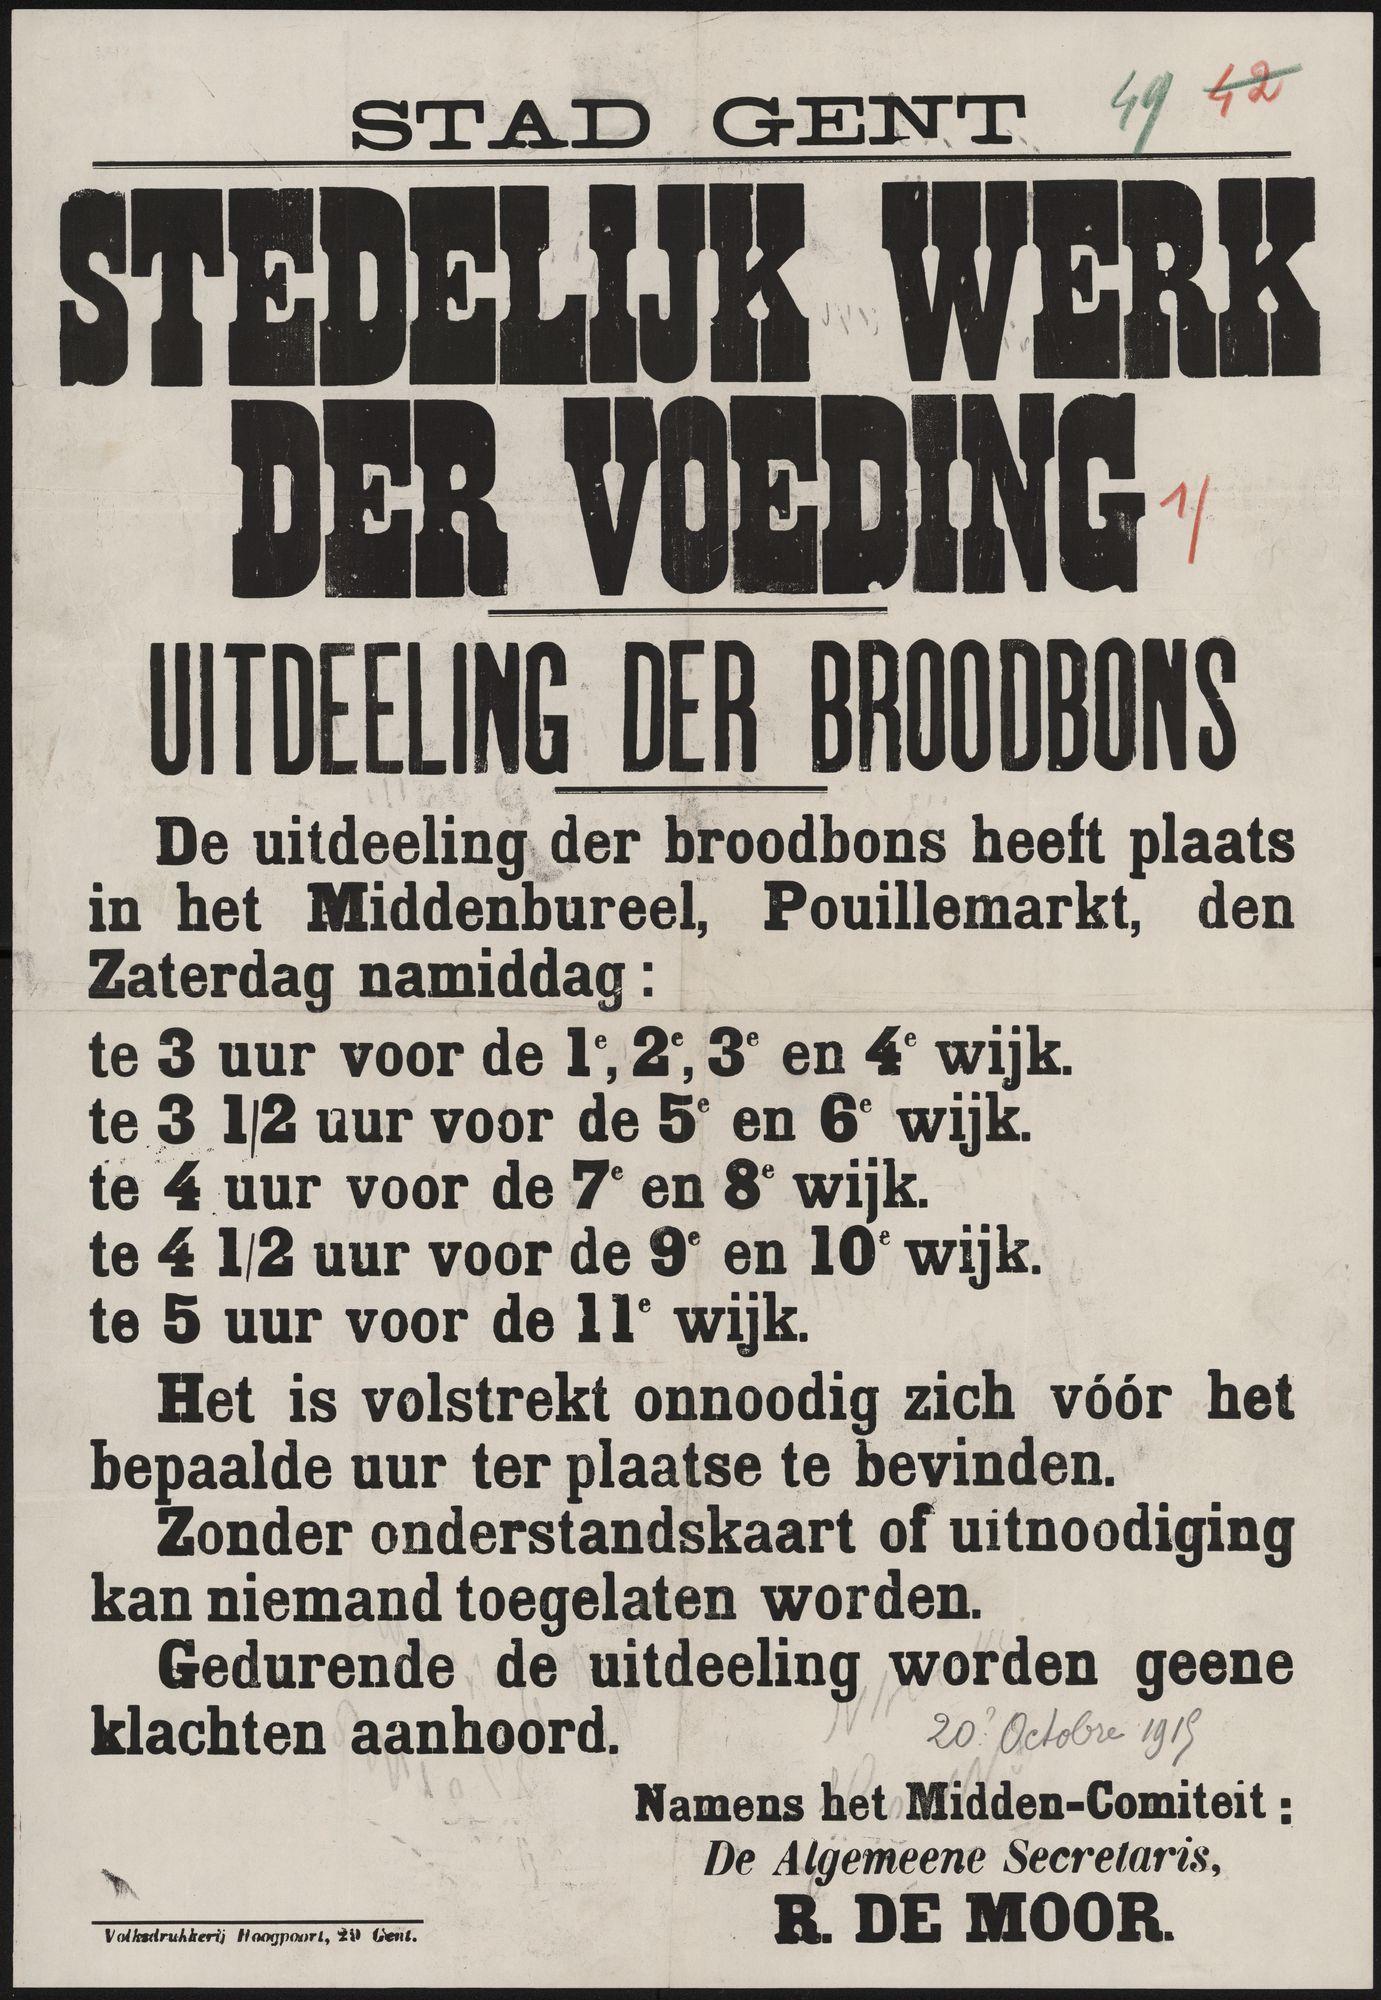 Stad Gent, Stedelijk werk der voeding, Uitdeeling der broodbons.